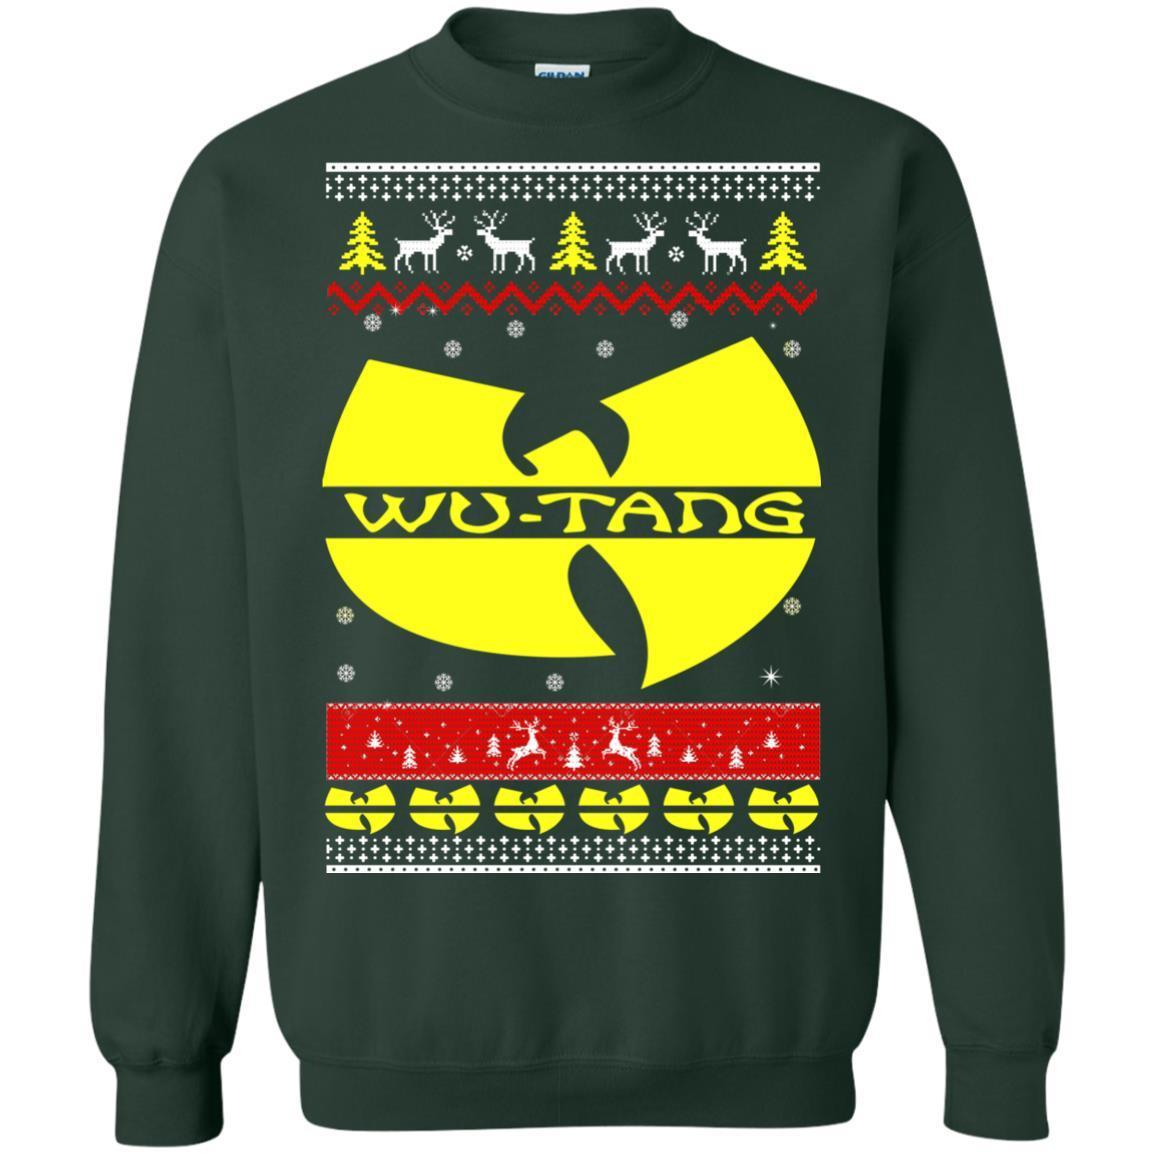 Wu Tang Clan Ugly Sweater Shirts